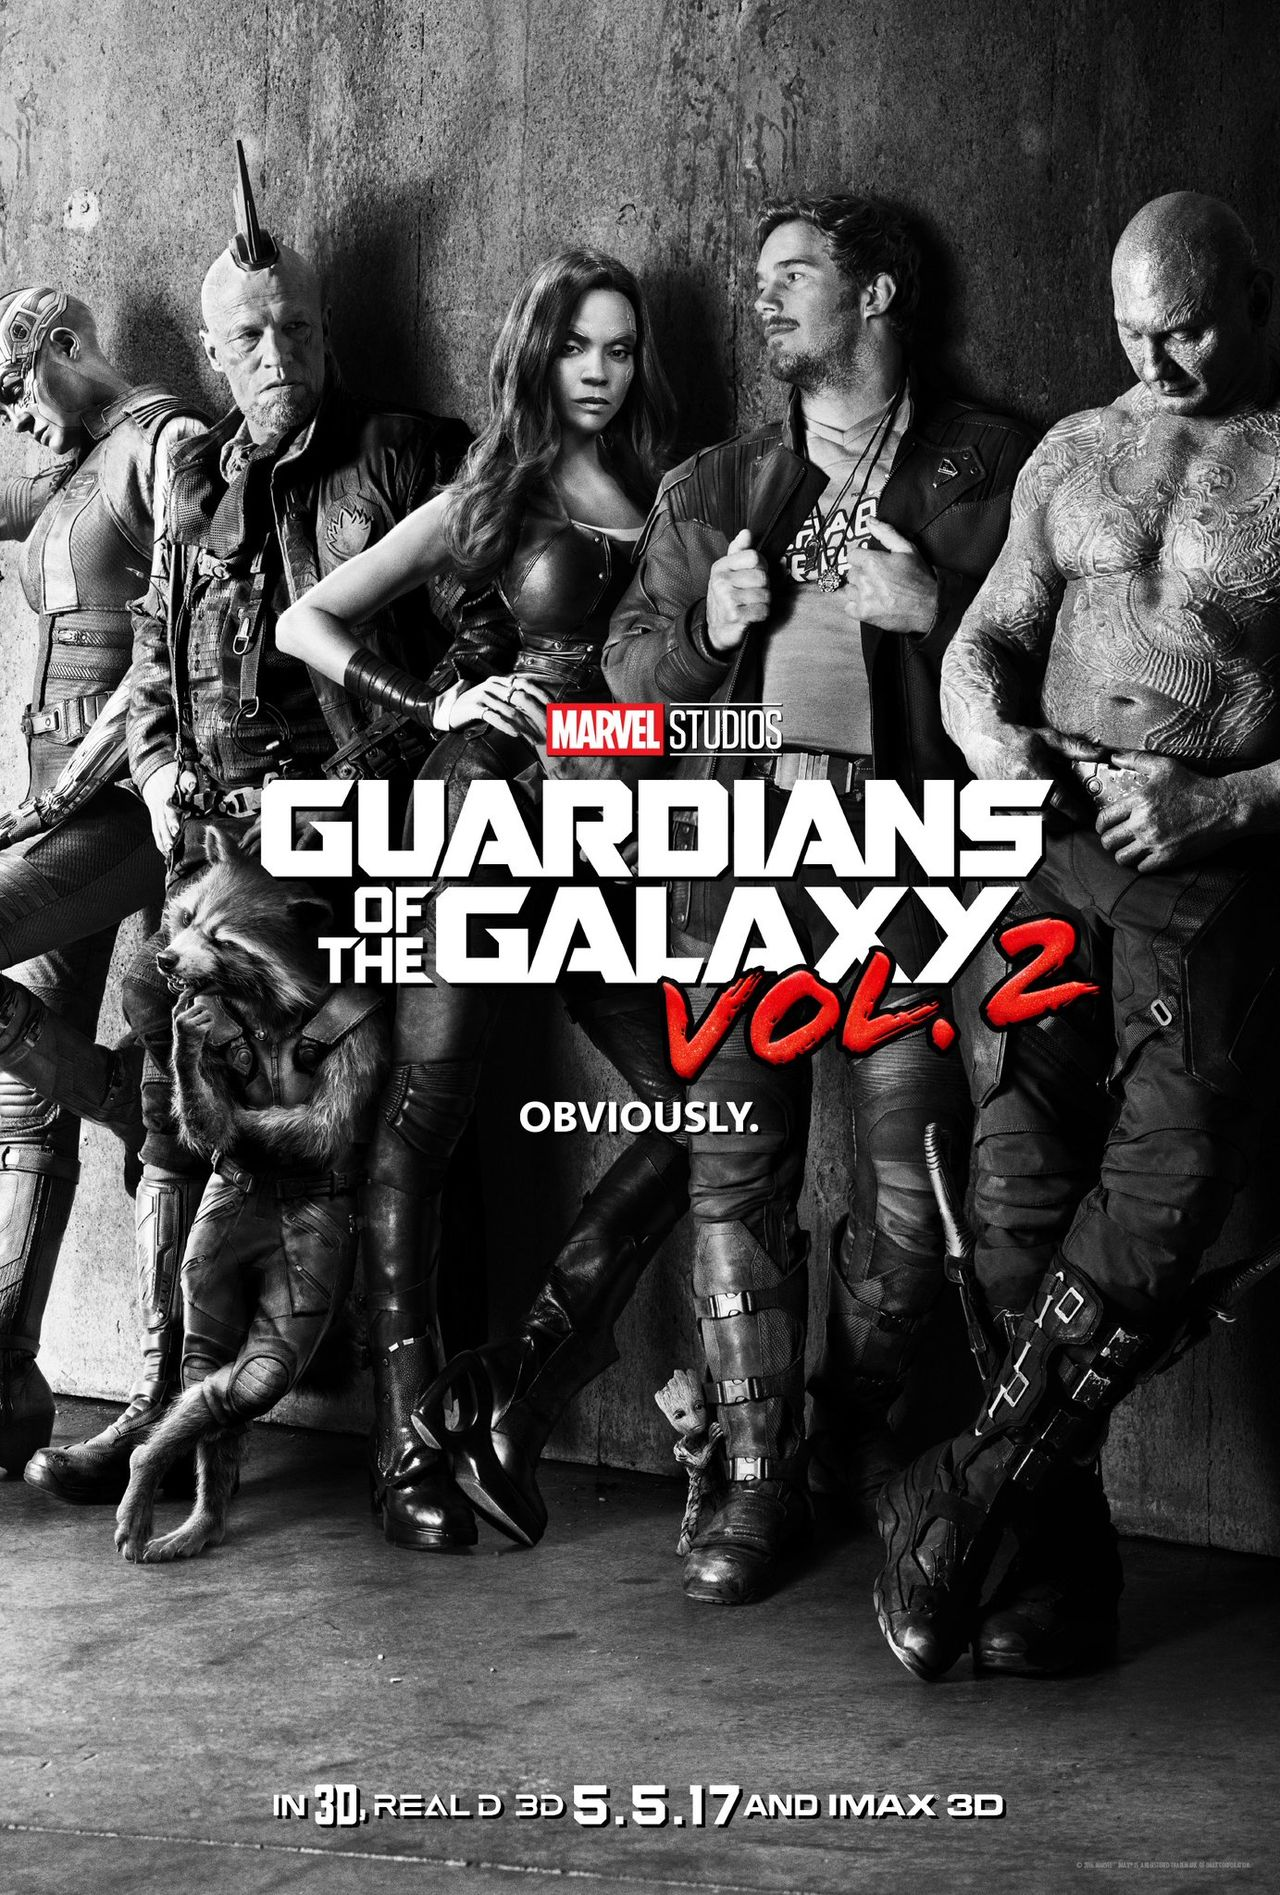 Affisch för Guardians of the Galaxy Vol. 2